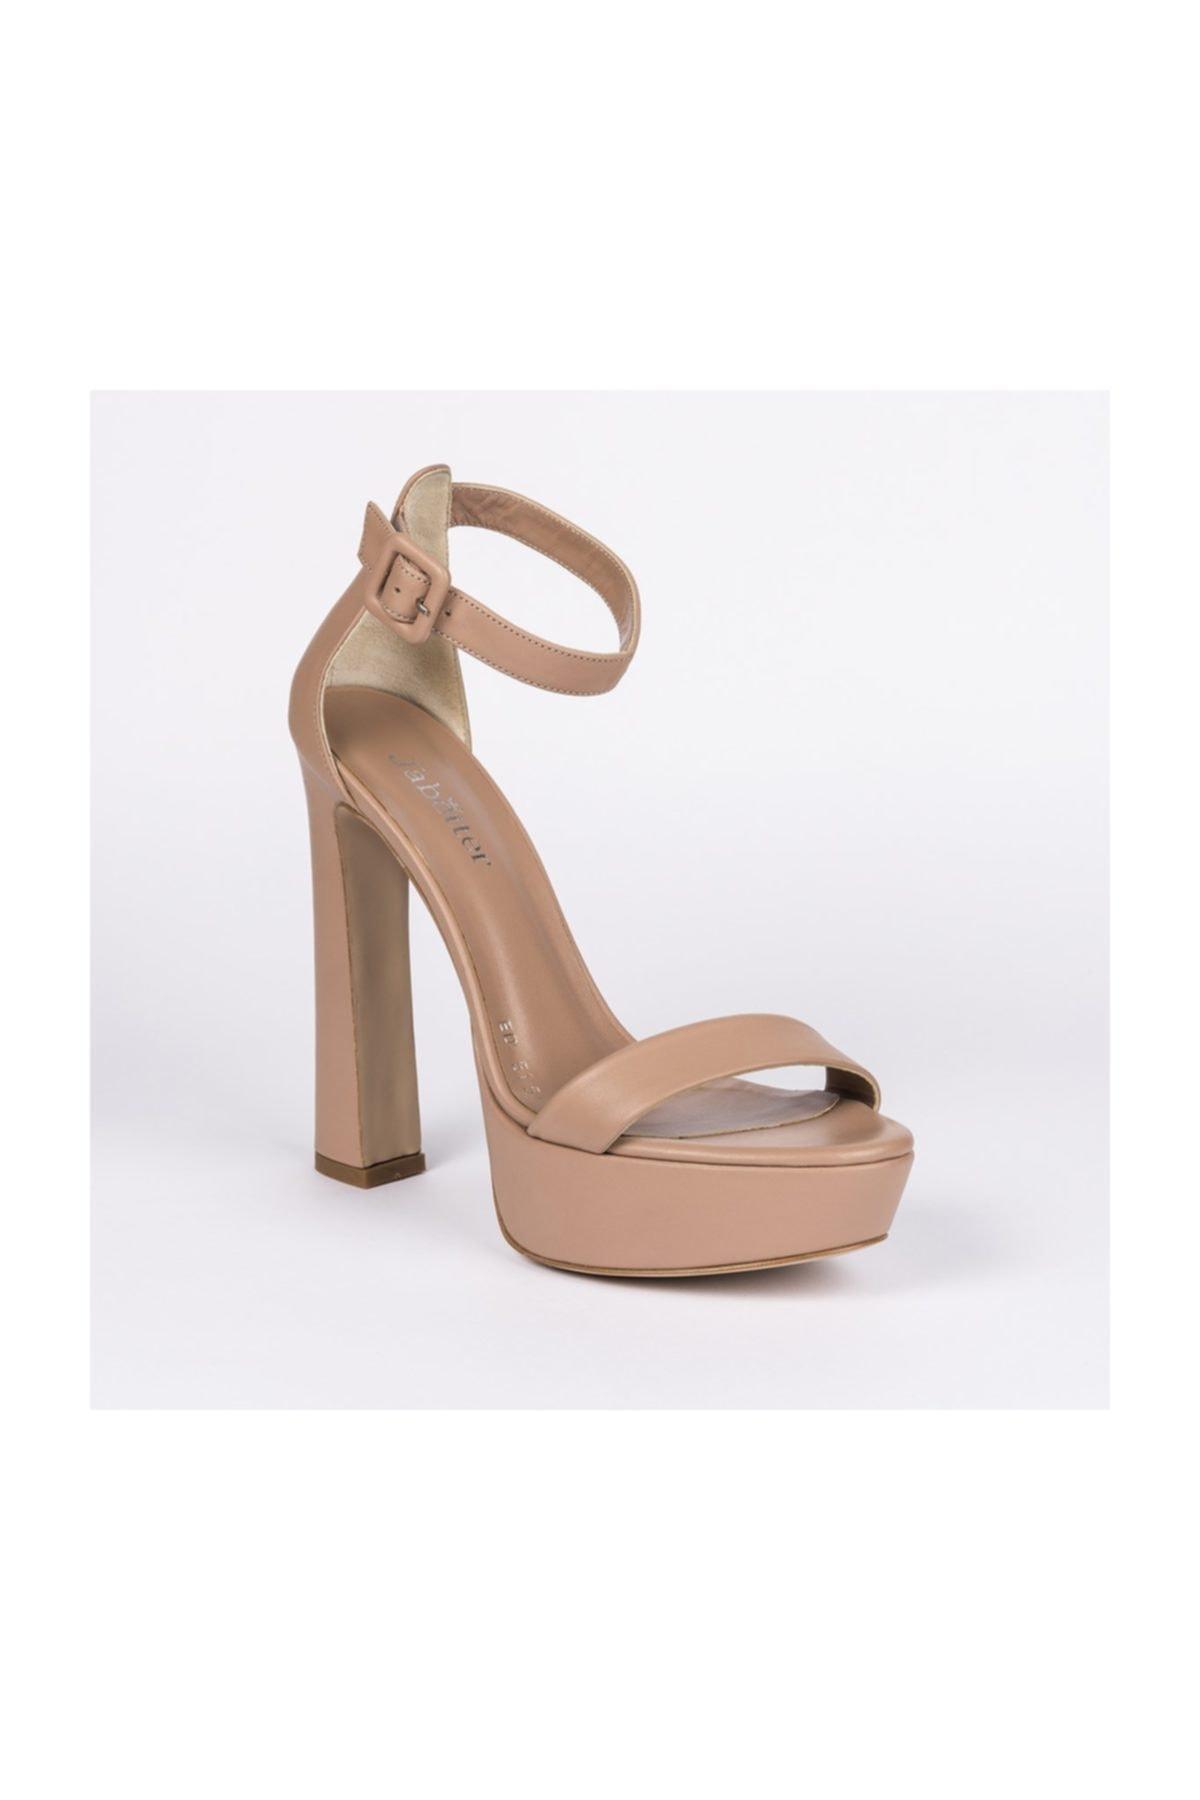 Jabotter Desire Karamel Deri Platform Topuklu Ayakkabı 2